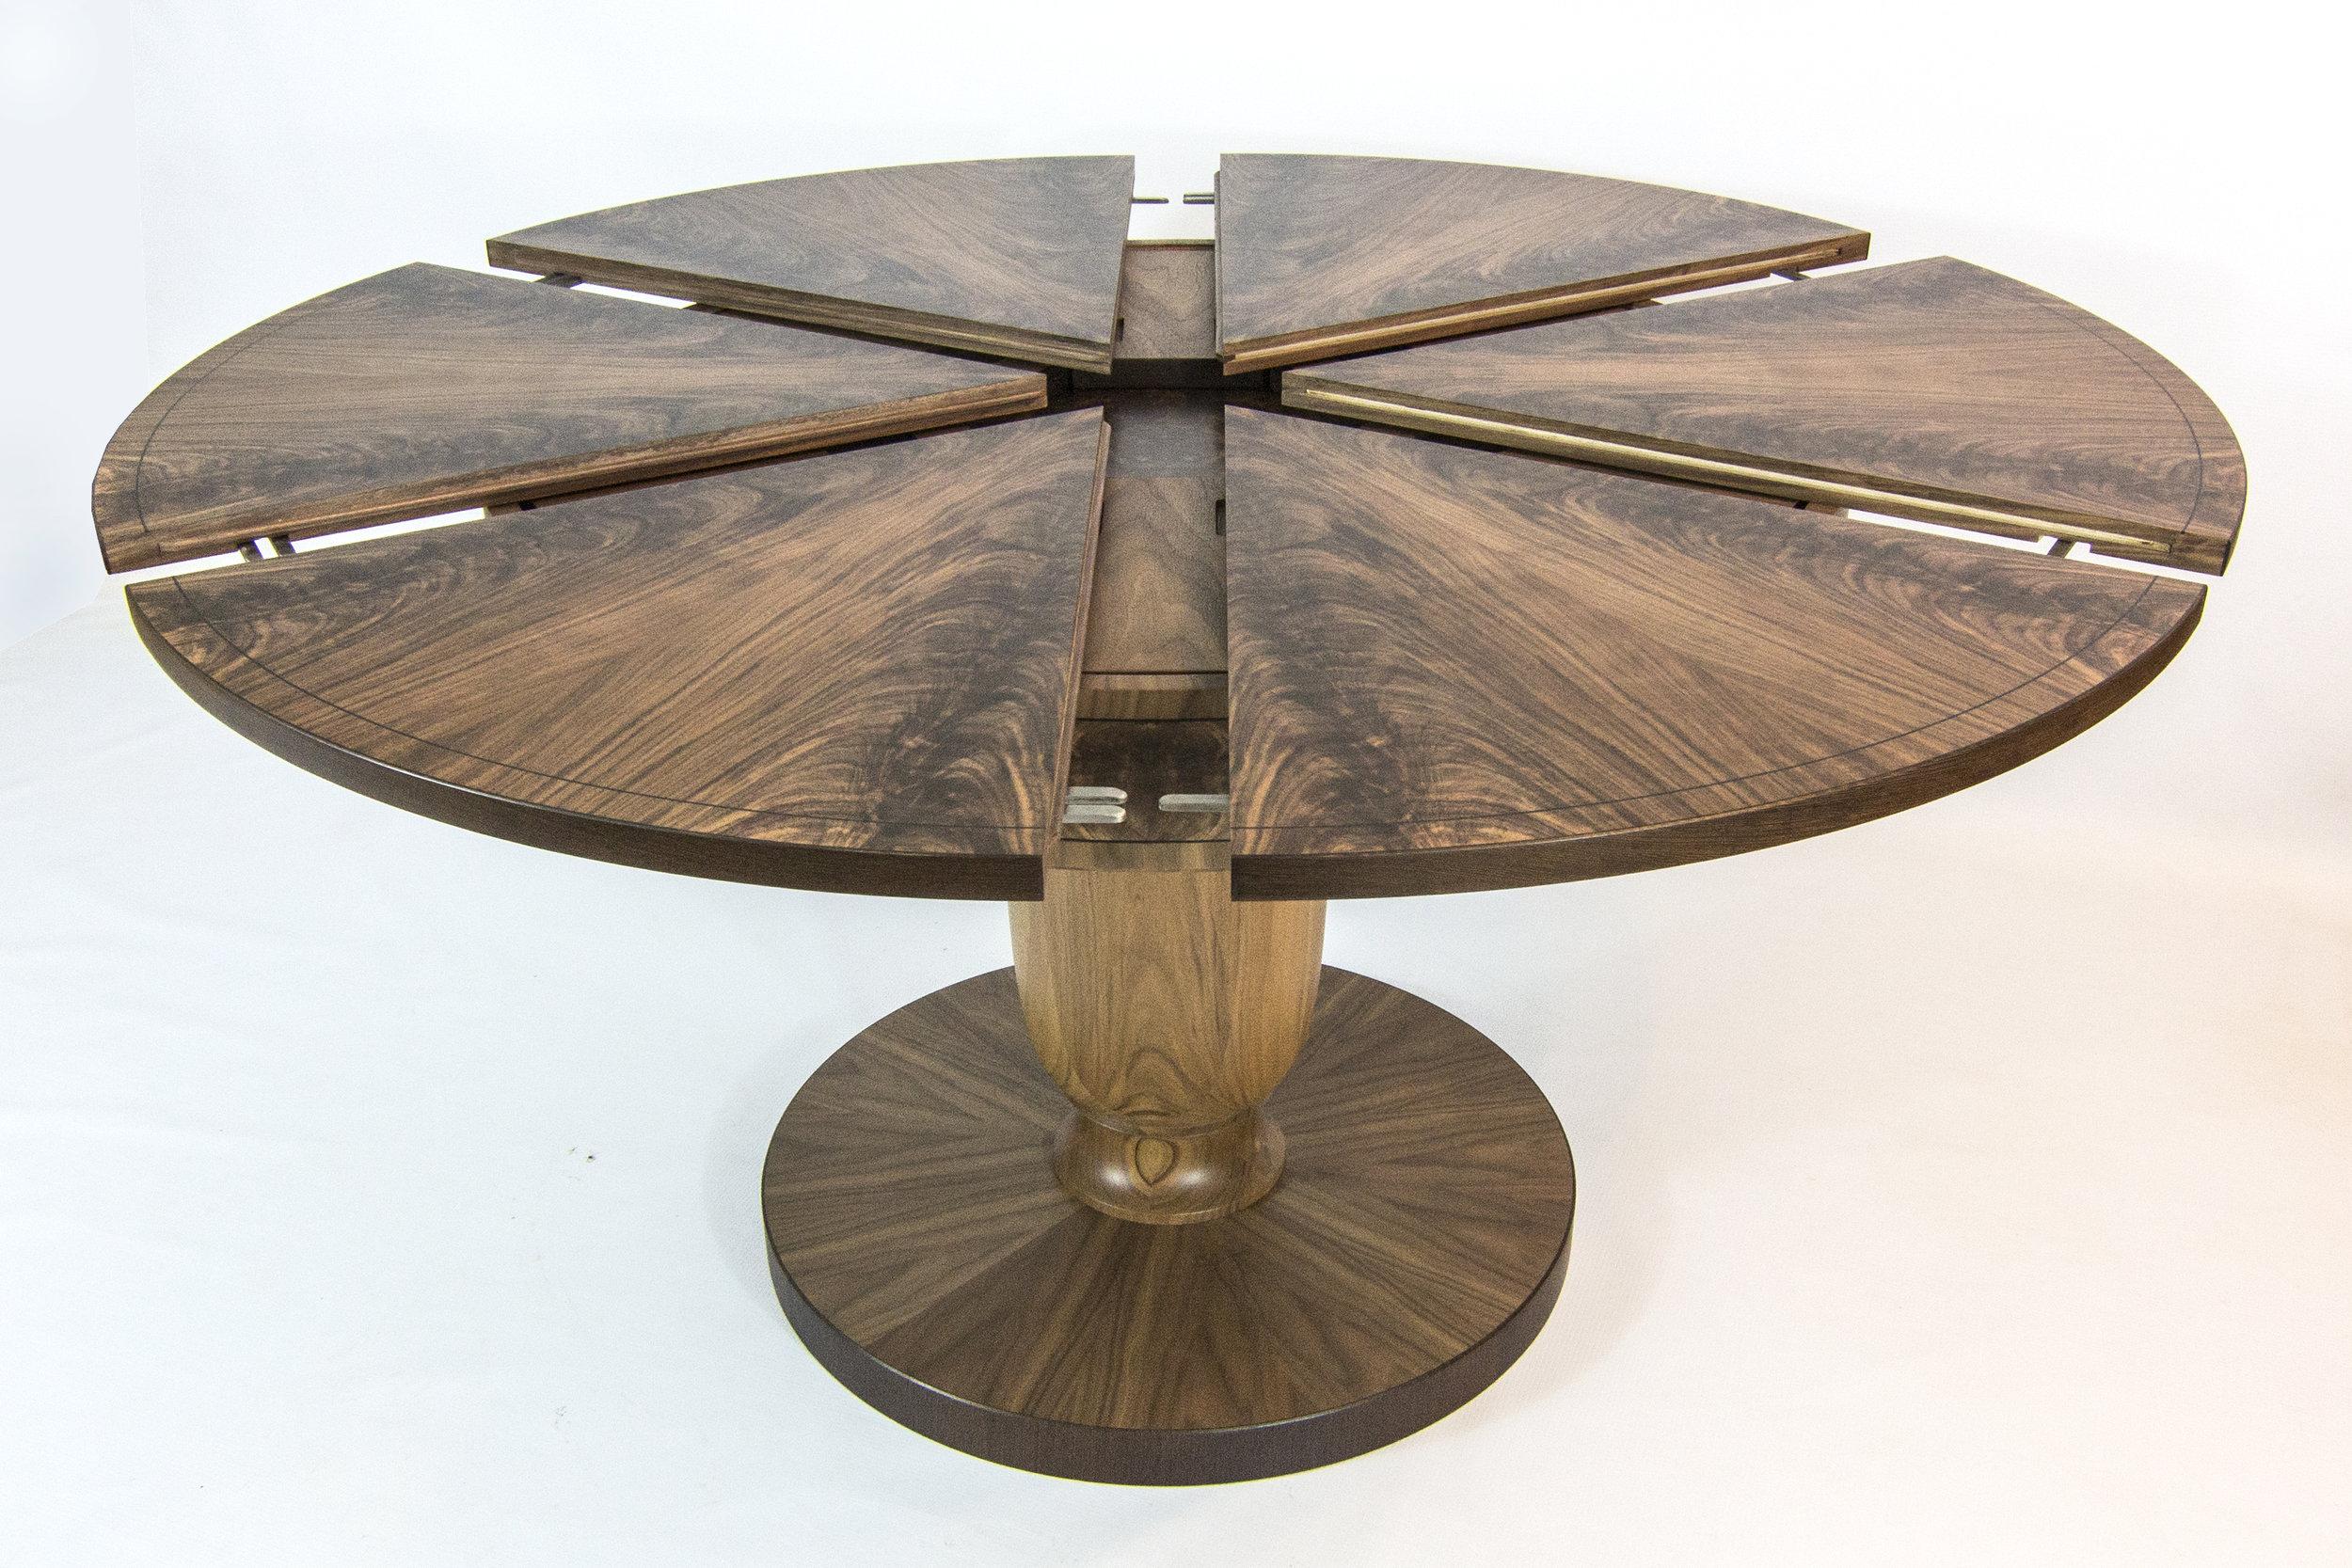 Walnut table 1.6m 02.jpg